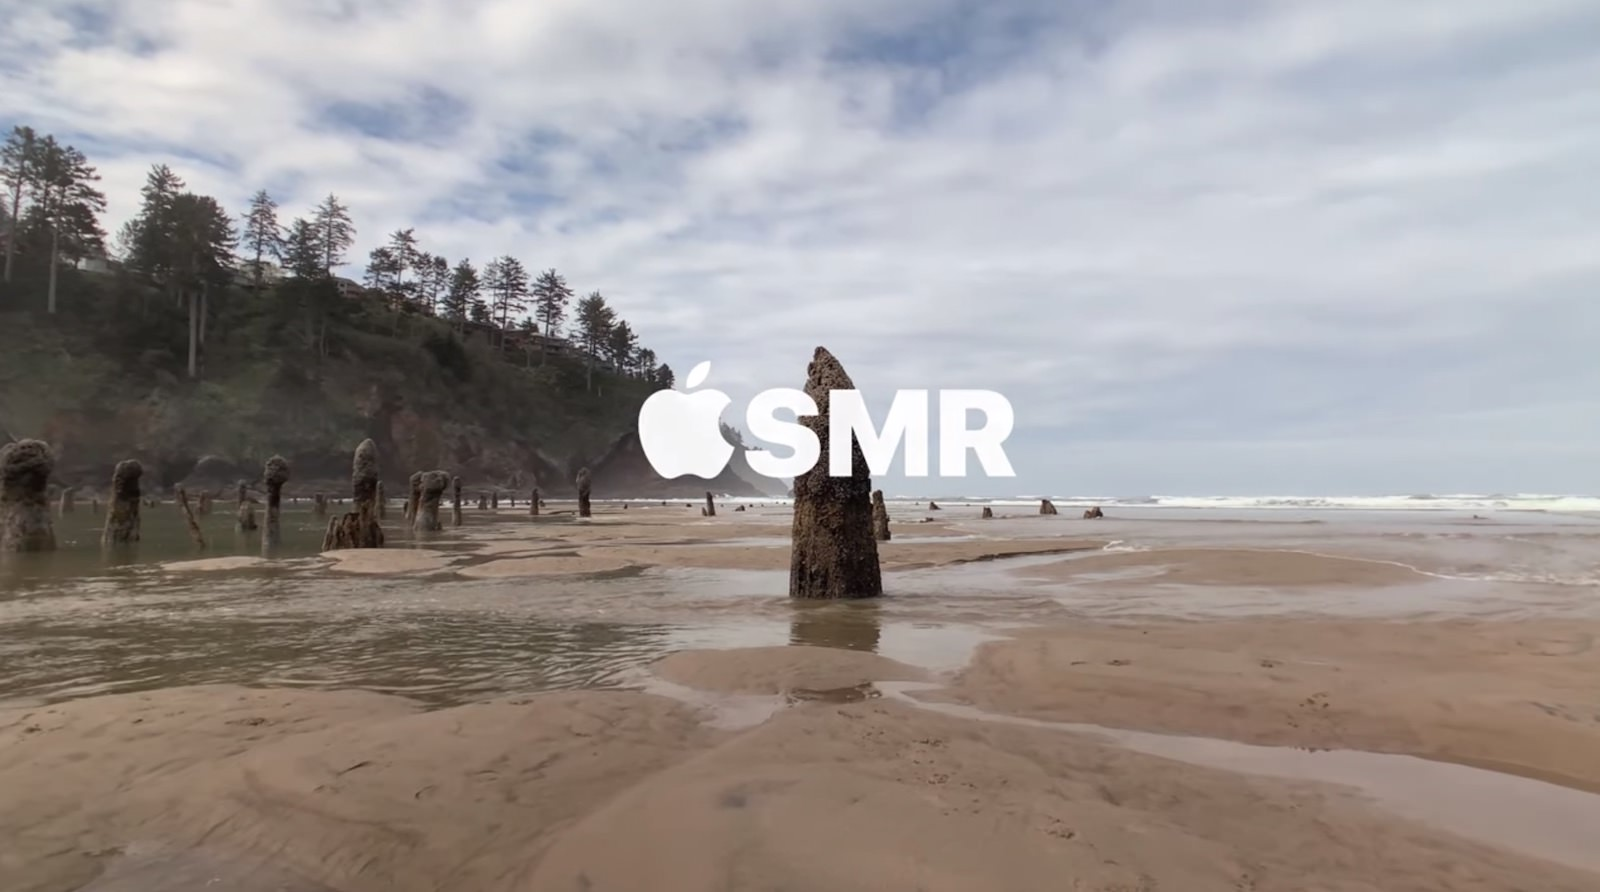 ASMR-Apple-Shot-on-iphone.jpg